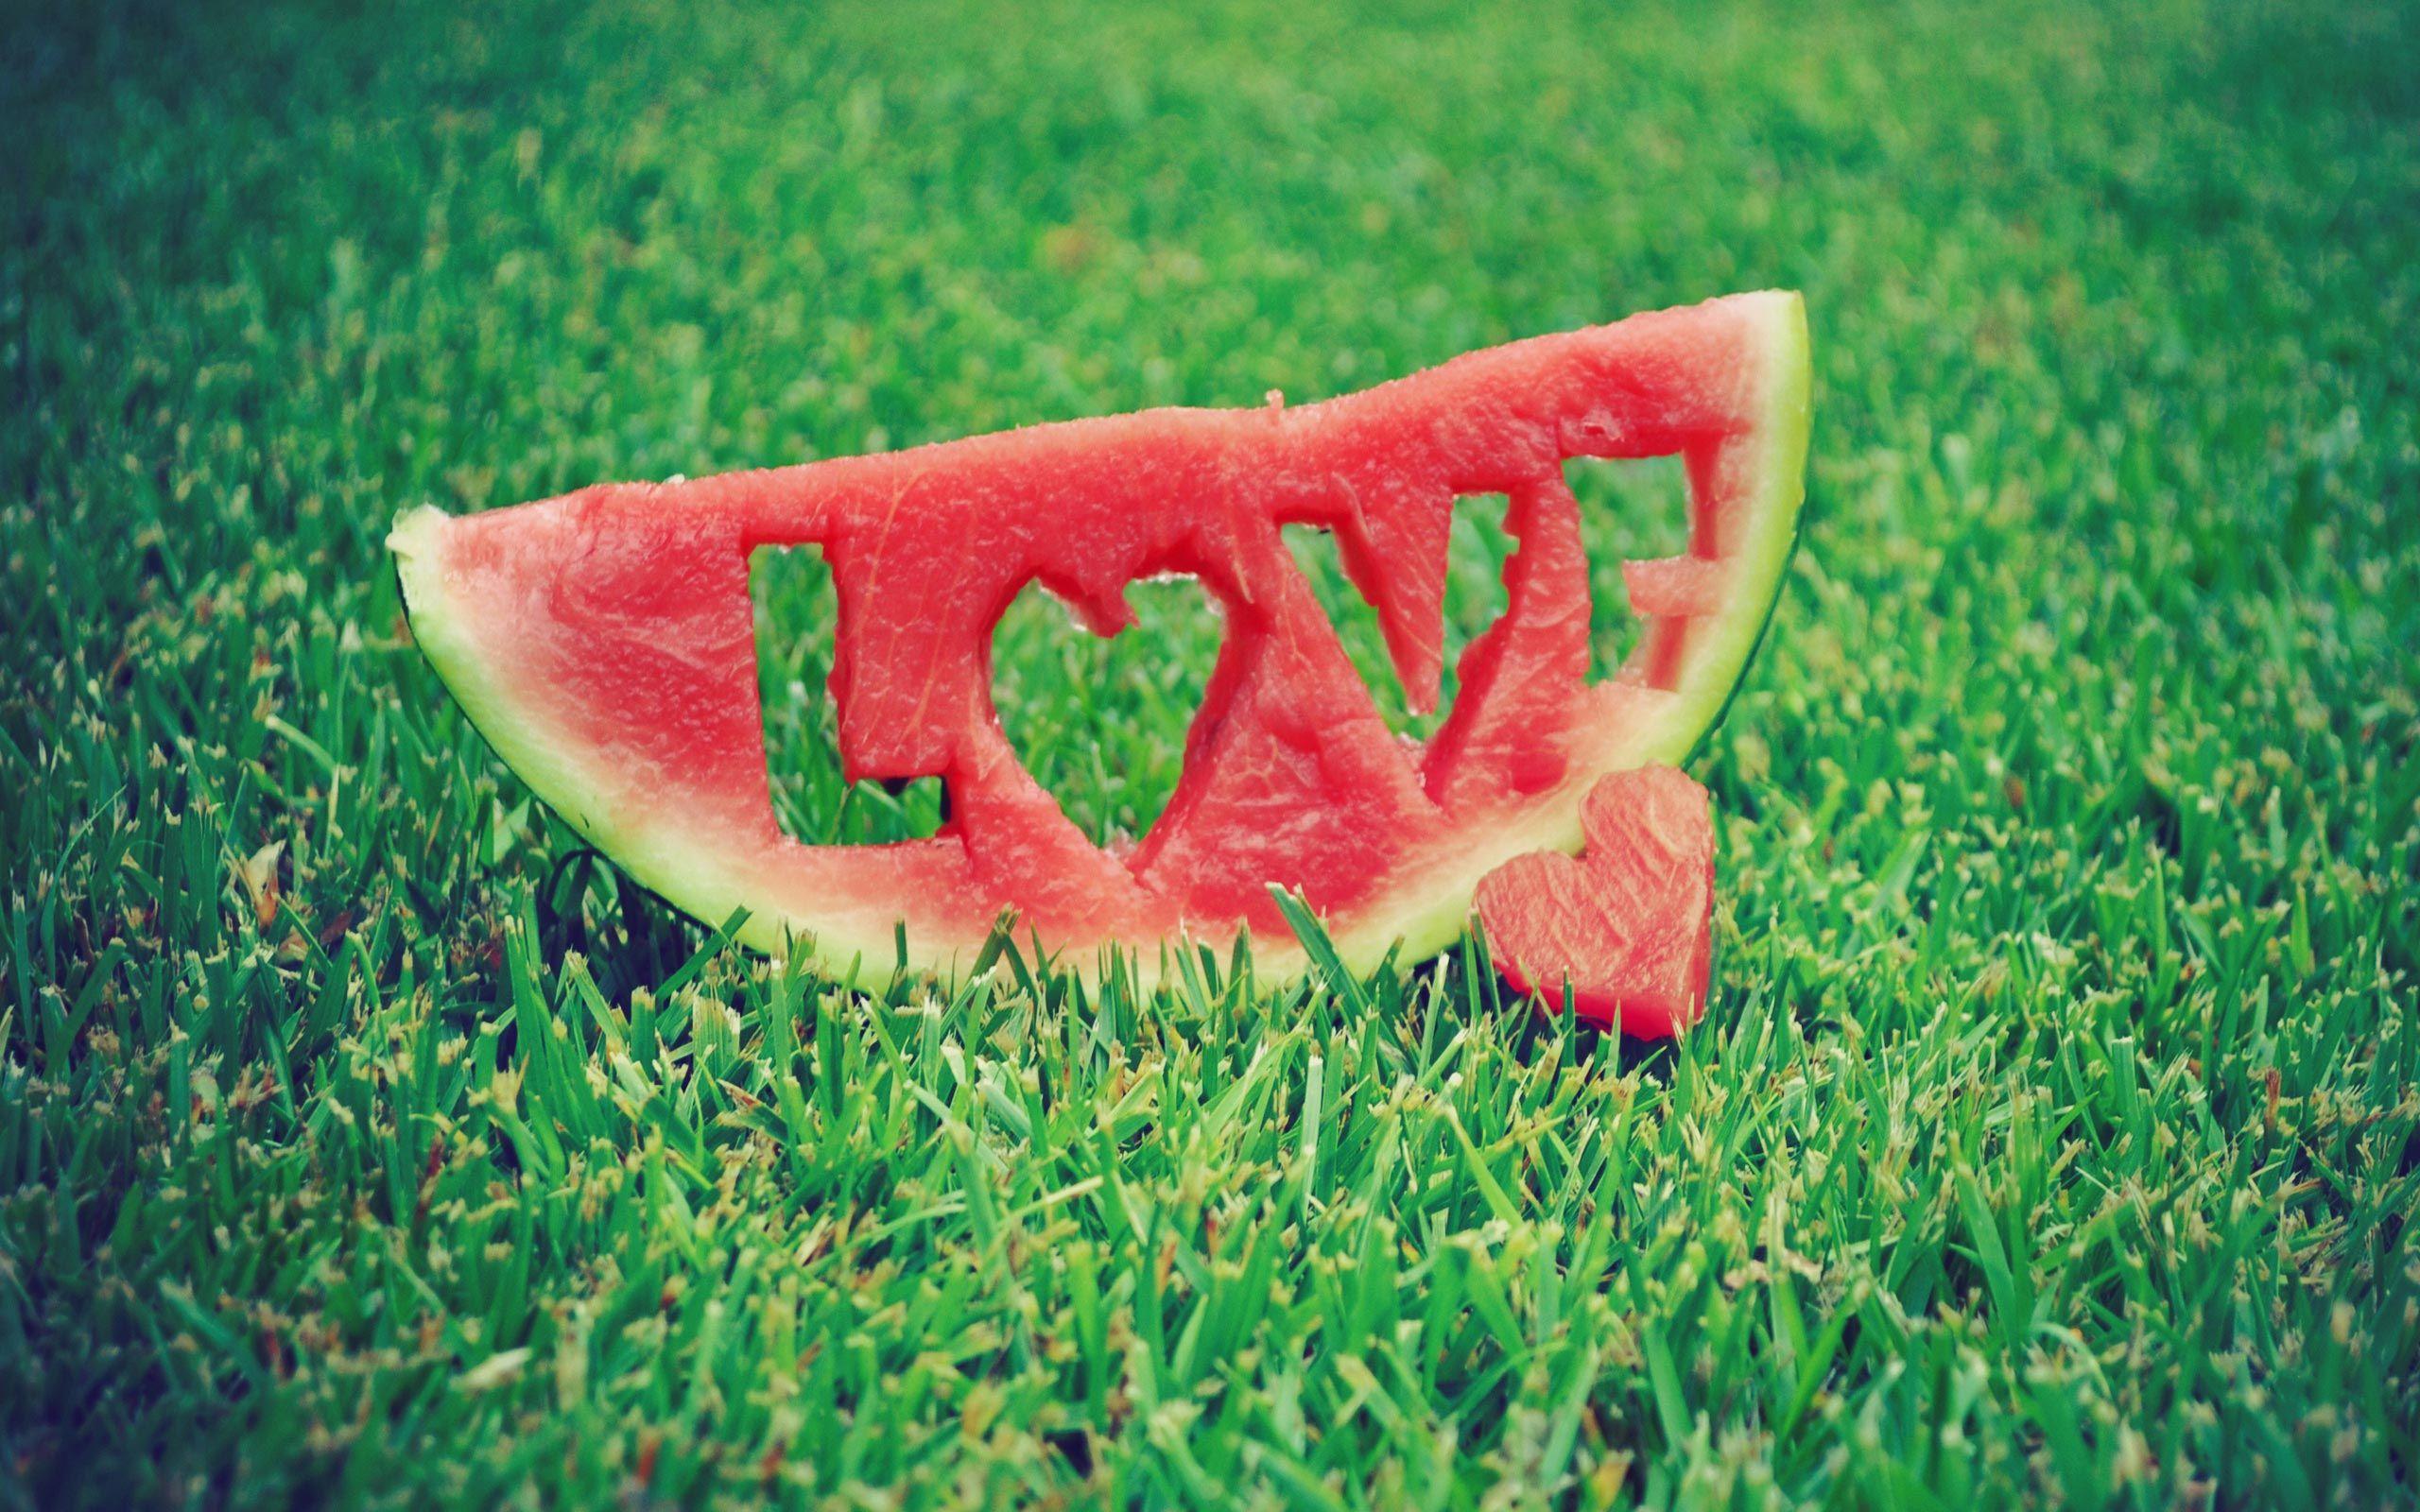 water melon pics